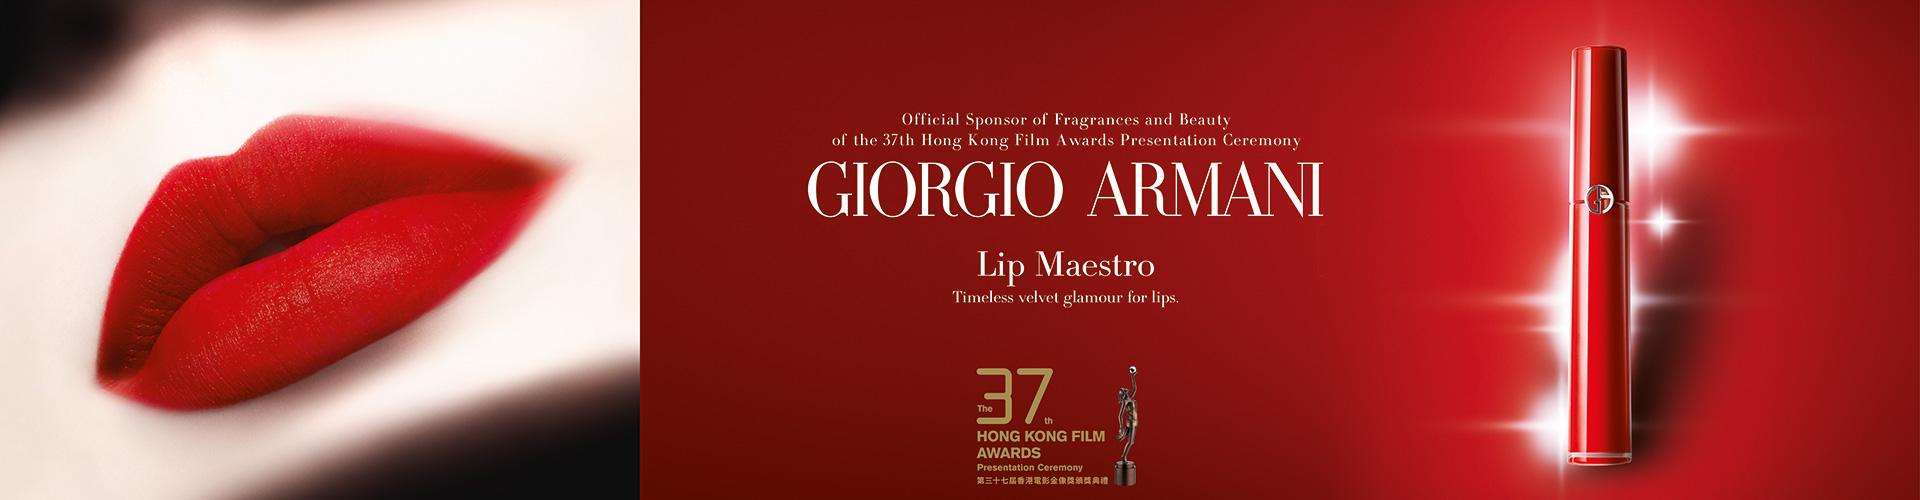 GIORGIO ARMANI Lip Maestro 經典時尚紅唇 紅地毯女星首選的唇妝